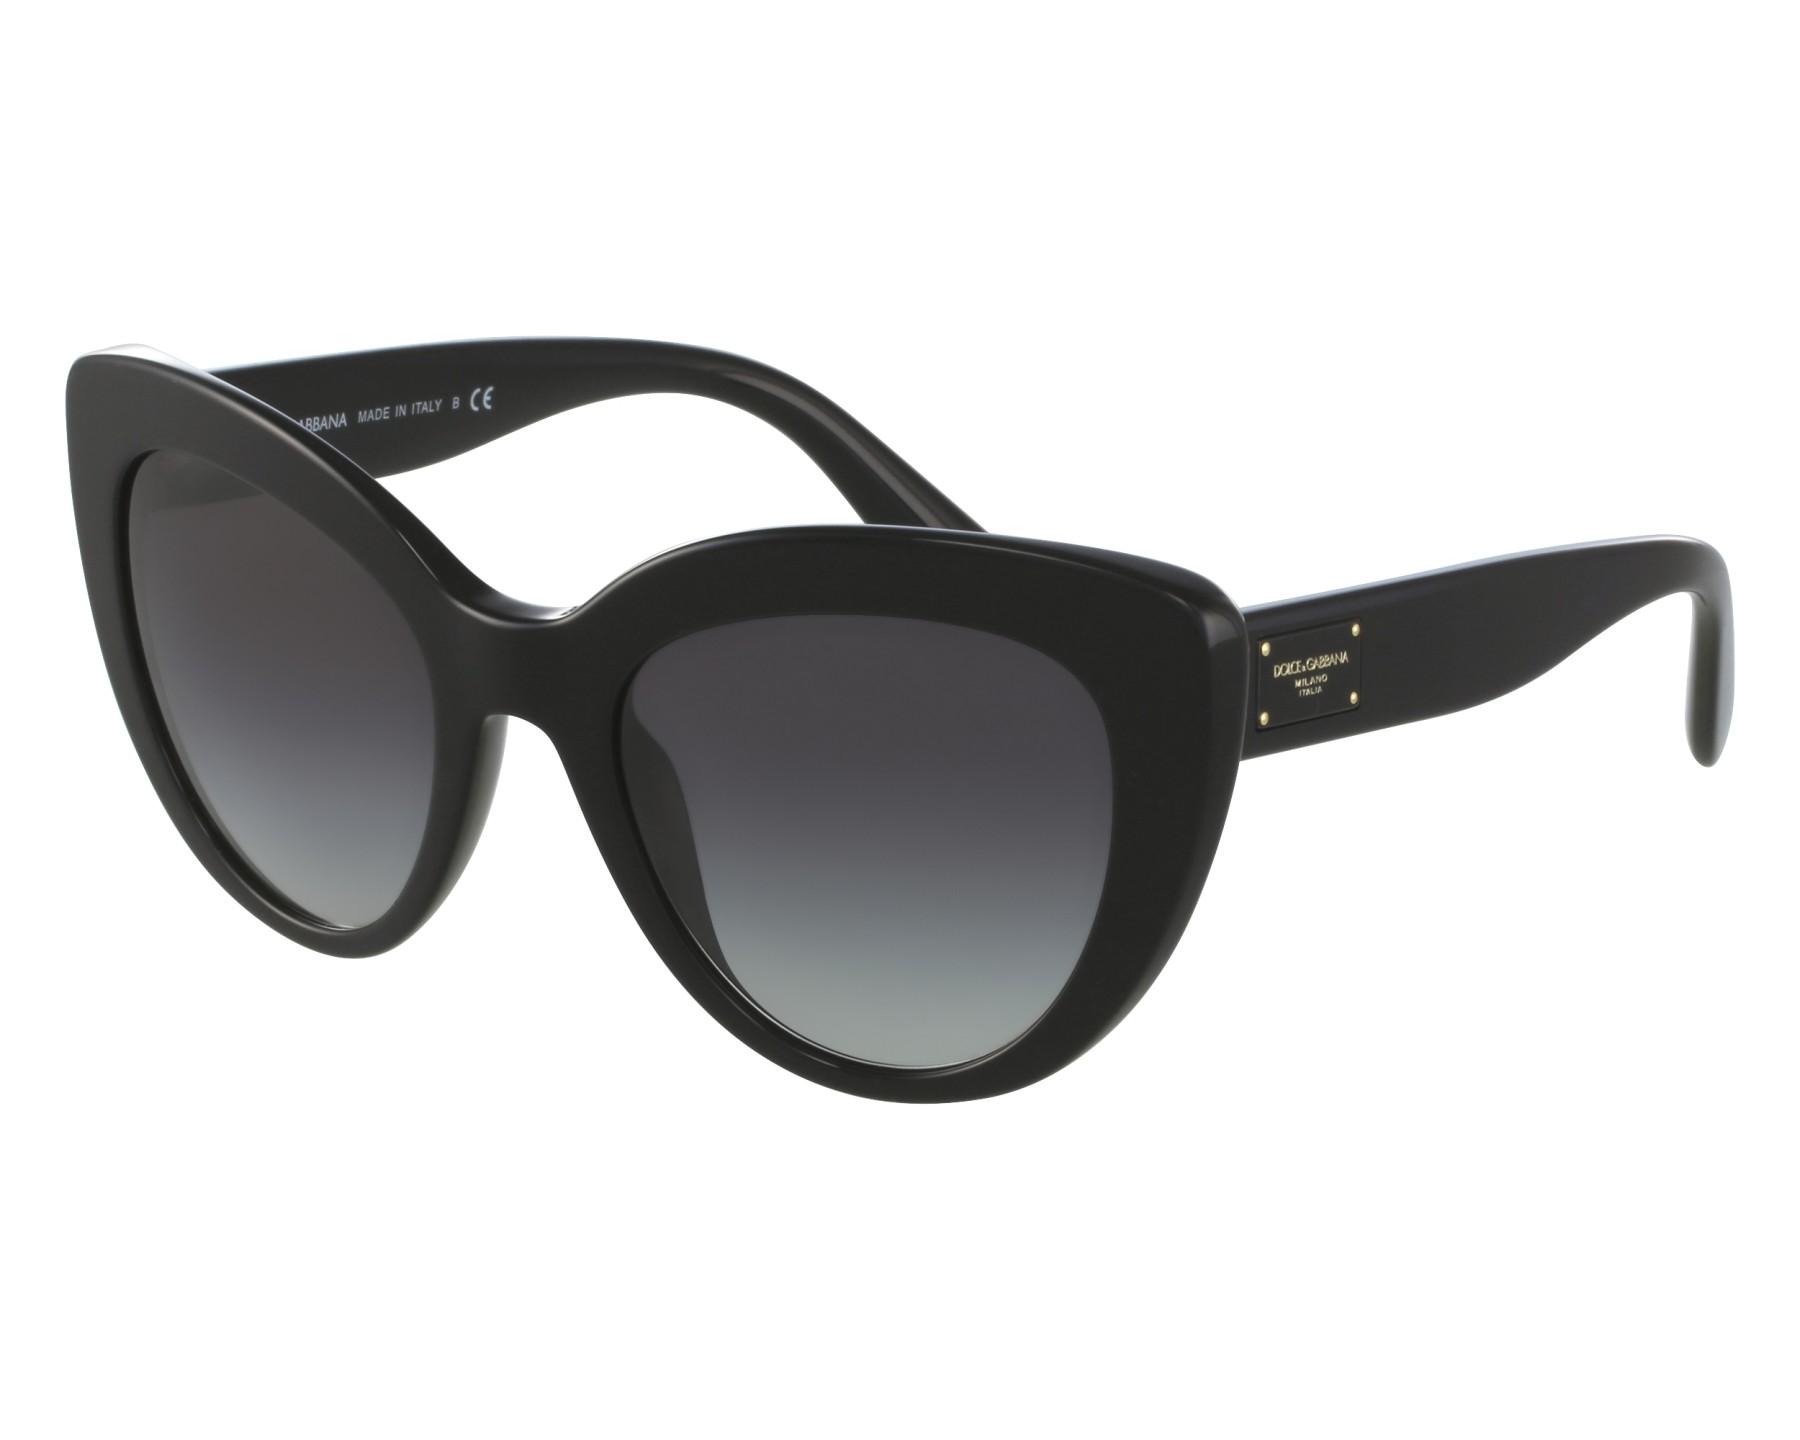 Dolce & Gabbana DG 4287 501/8G 1 LZSMShFx4